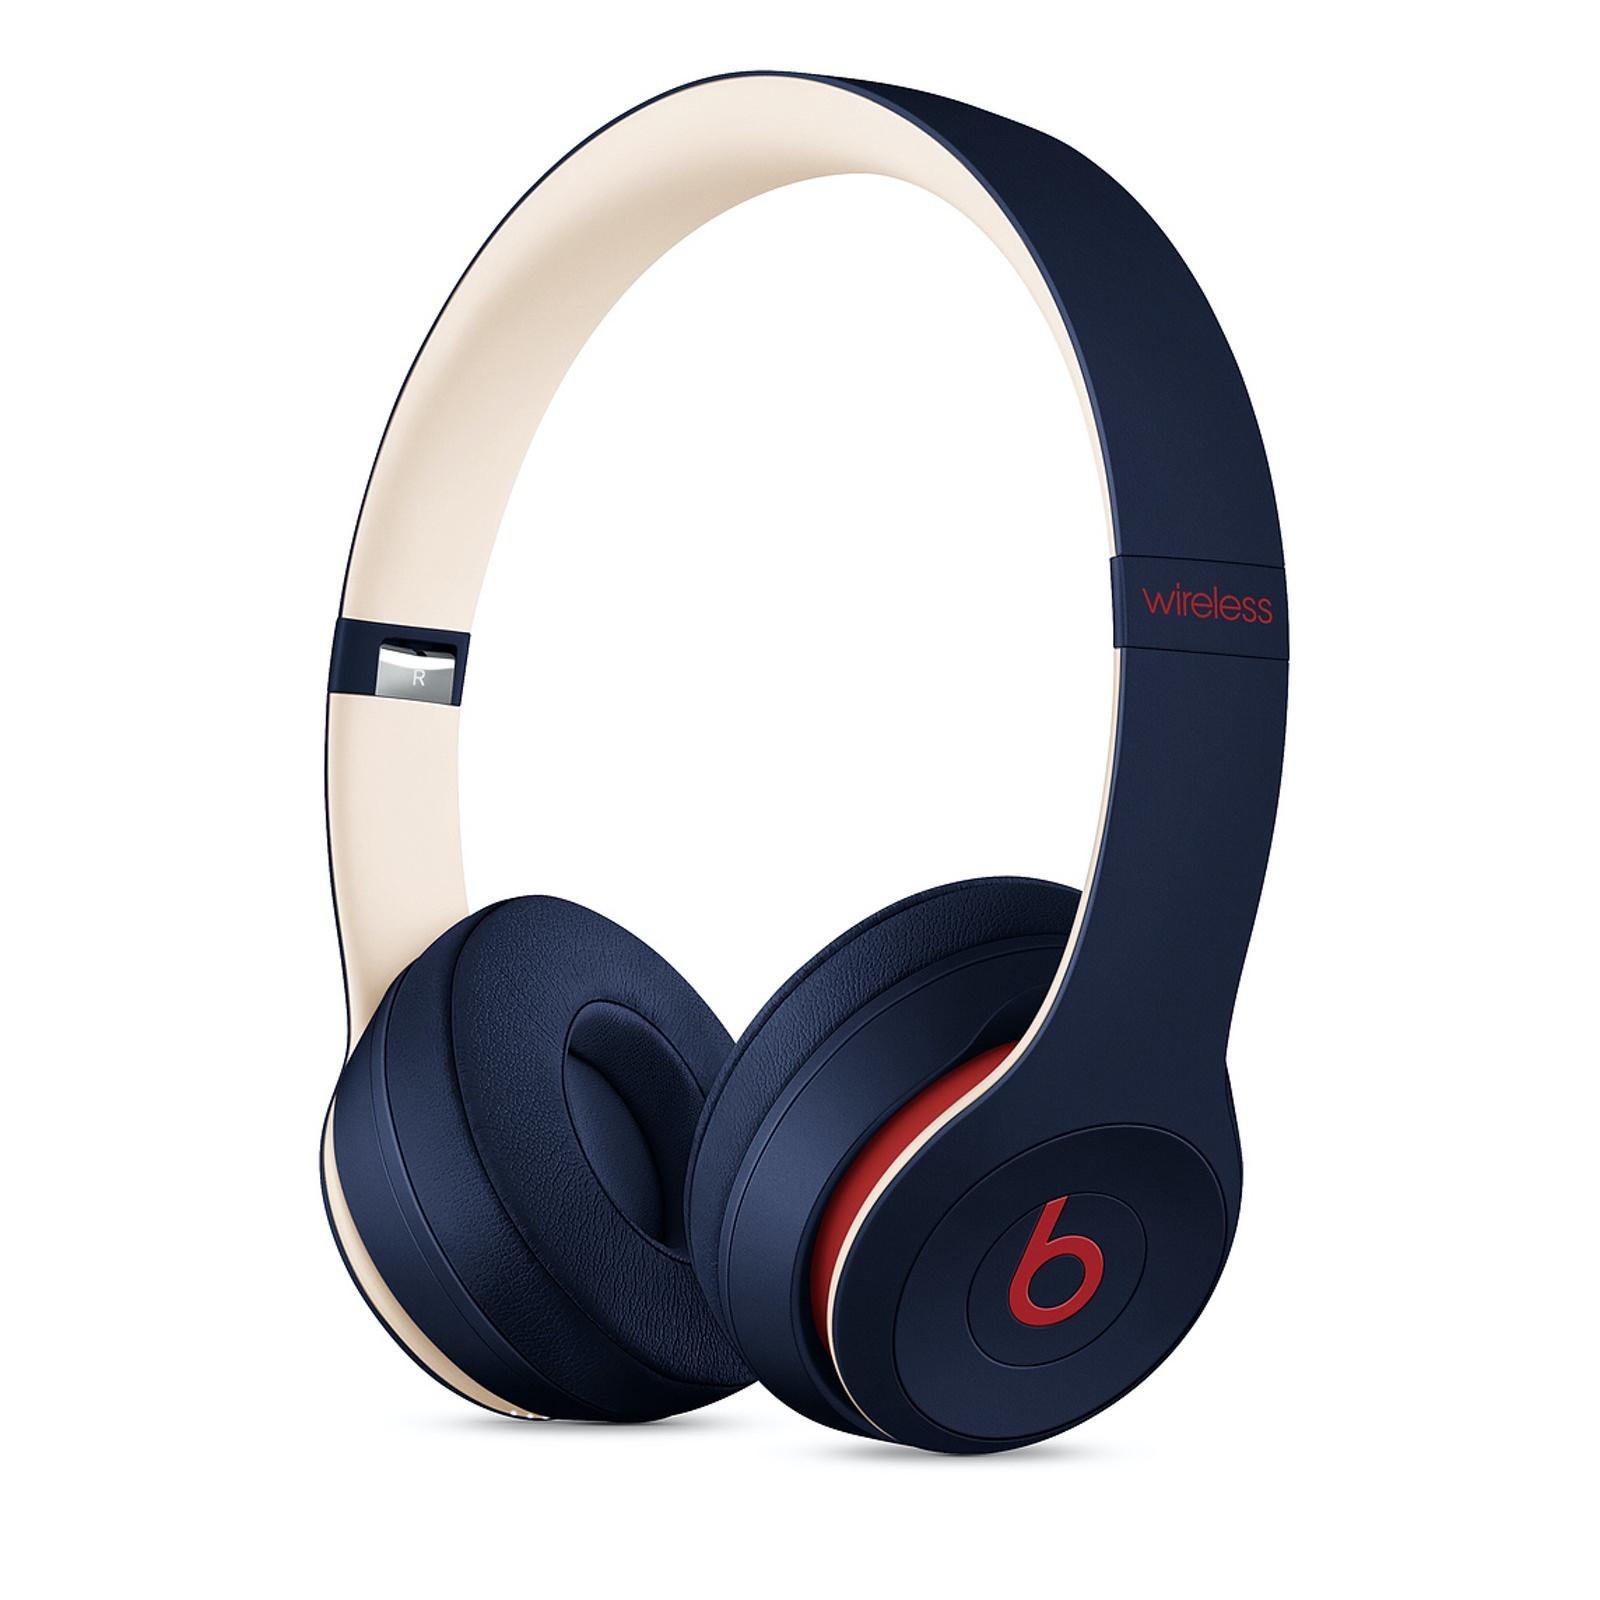 Beats-Solo3-Wireless-Beats-Club-Collection-01.jpeg